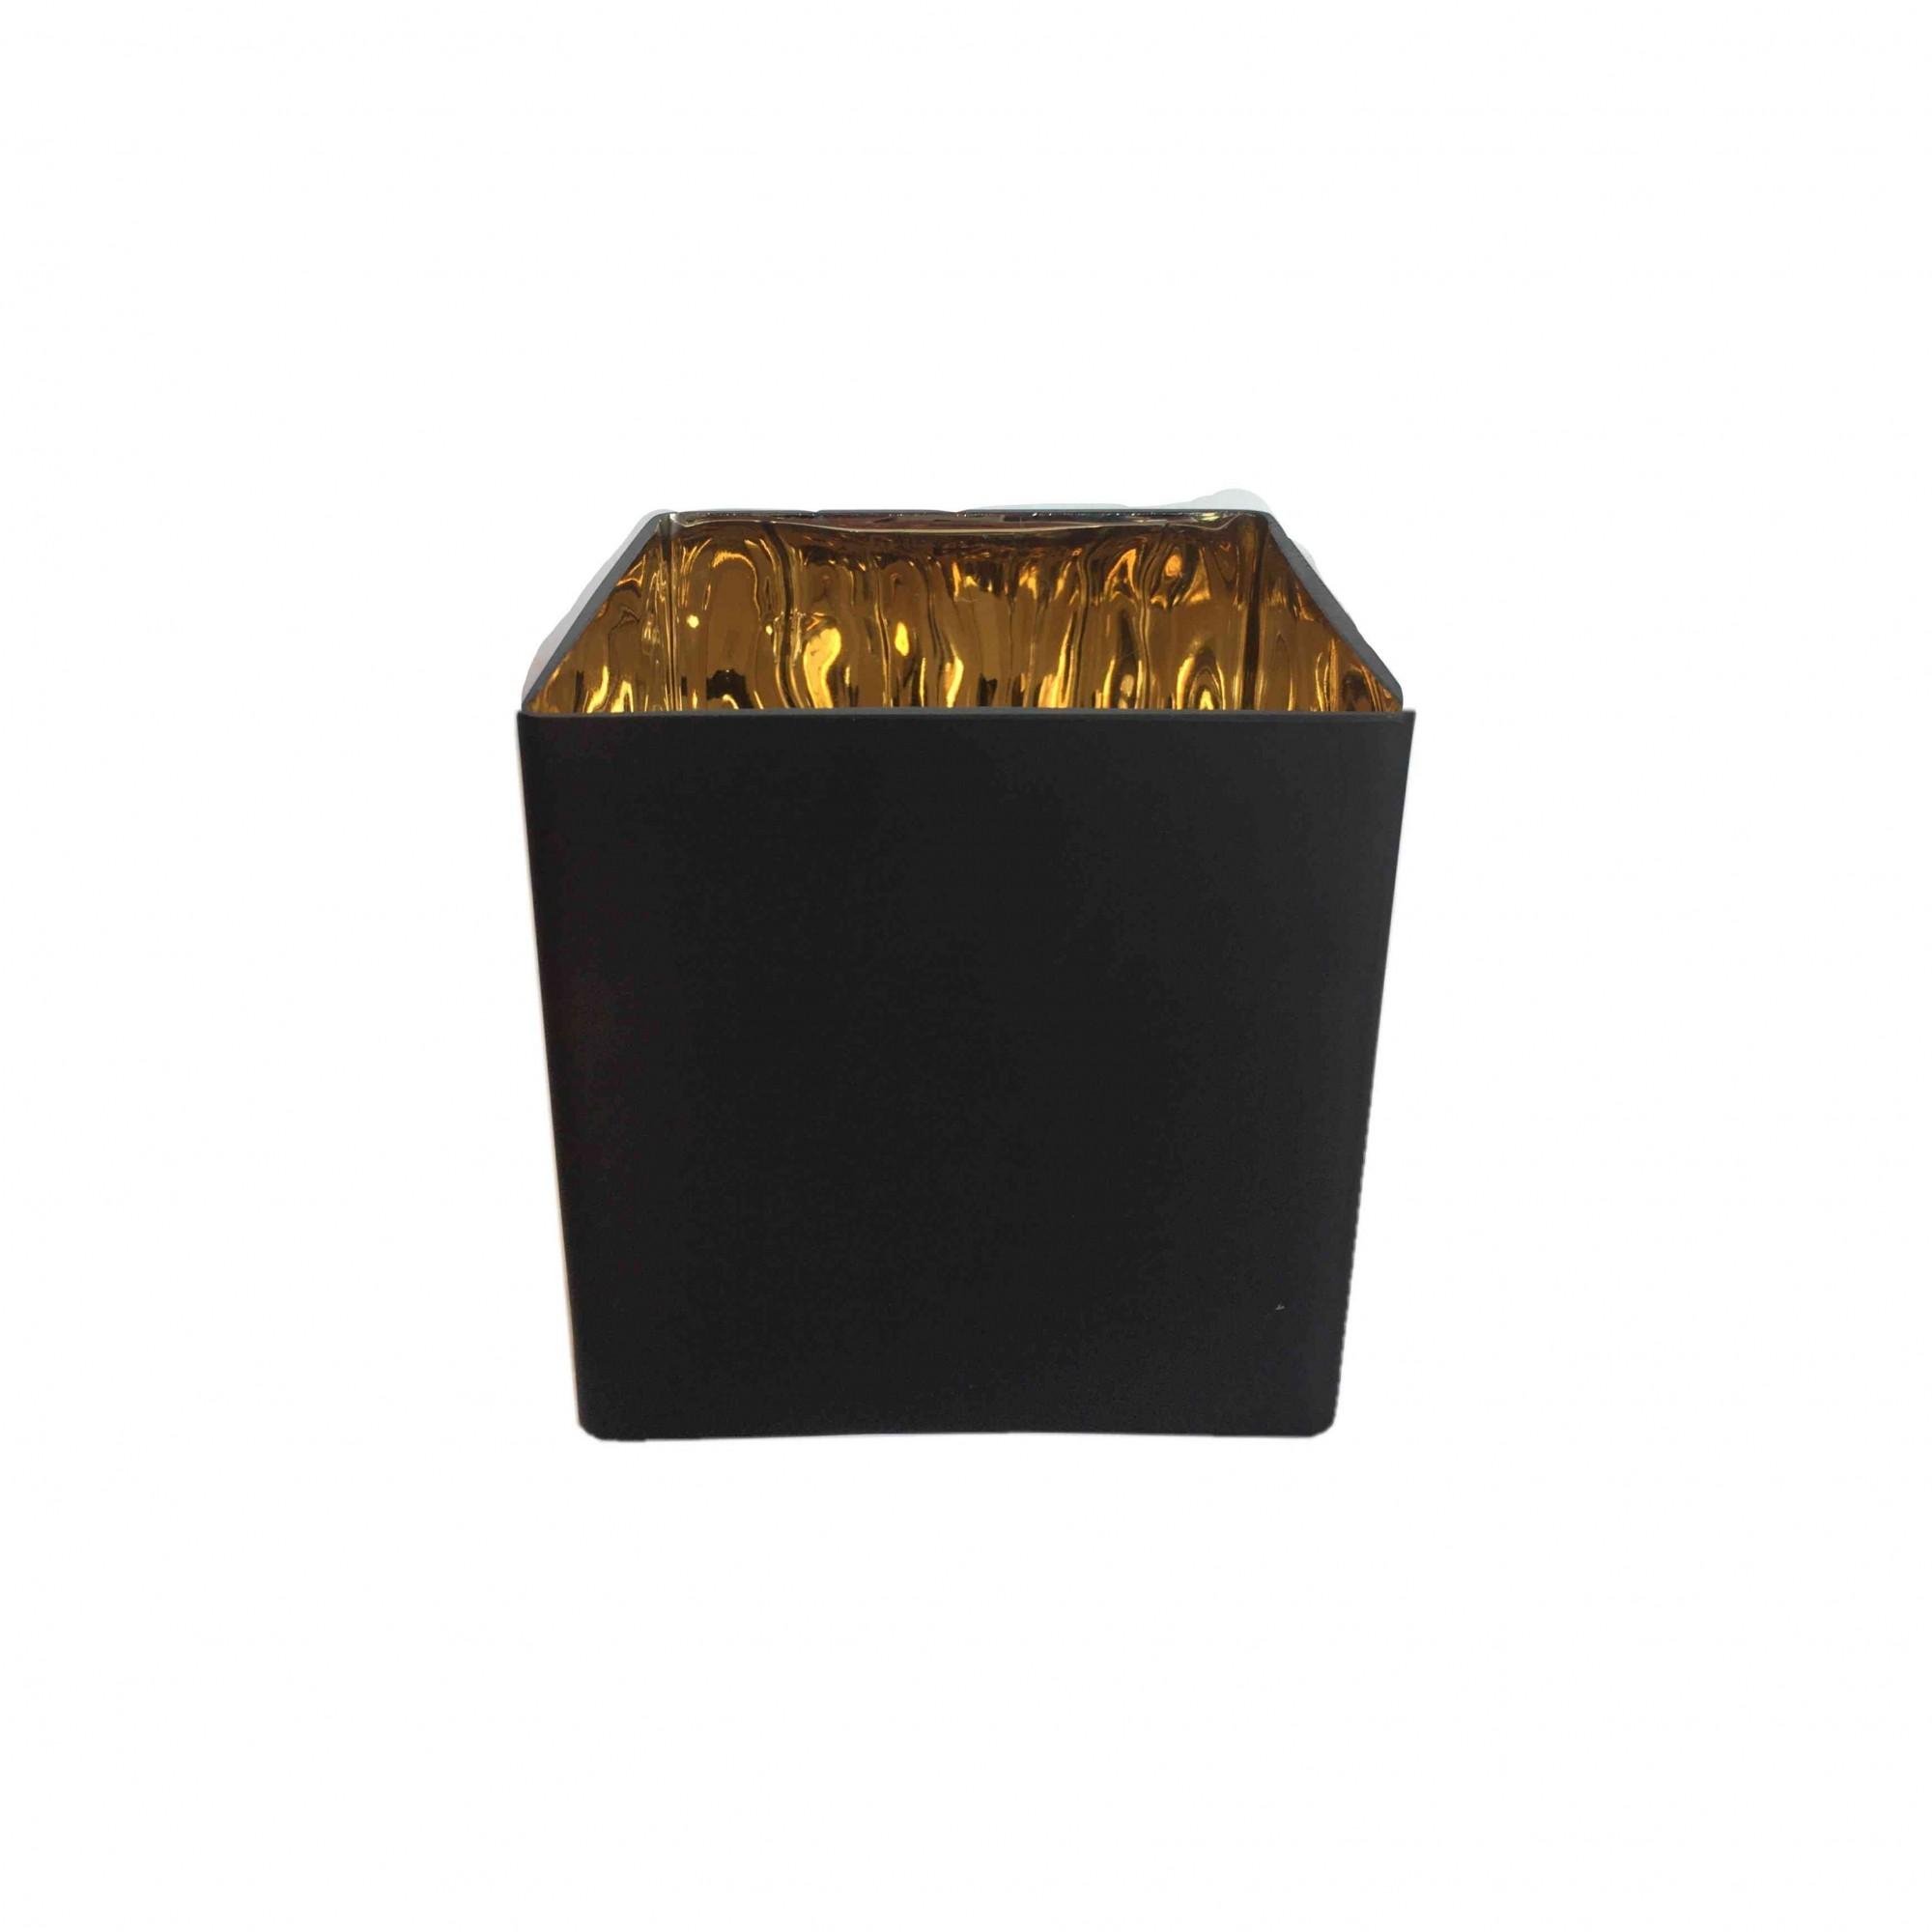 Vaso De Vidro Preto e Dourado Quadrado